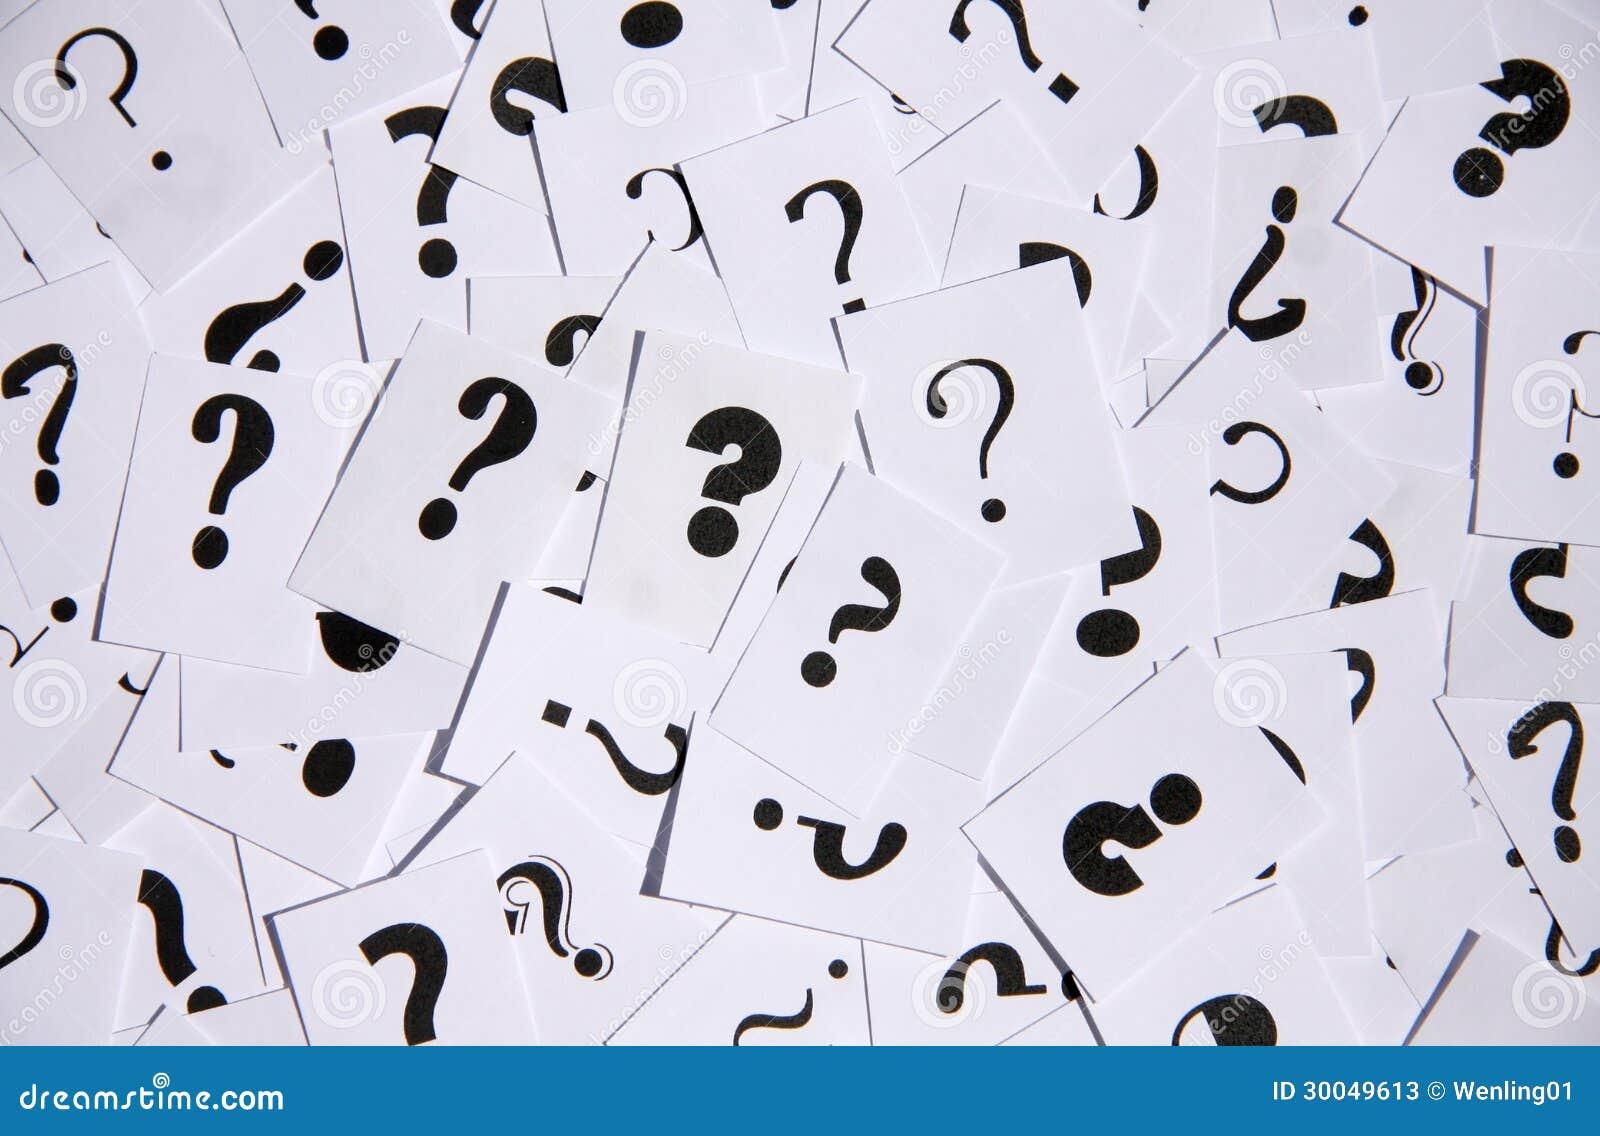 question mark wallpaper